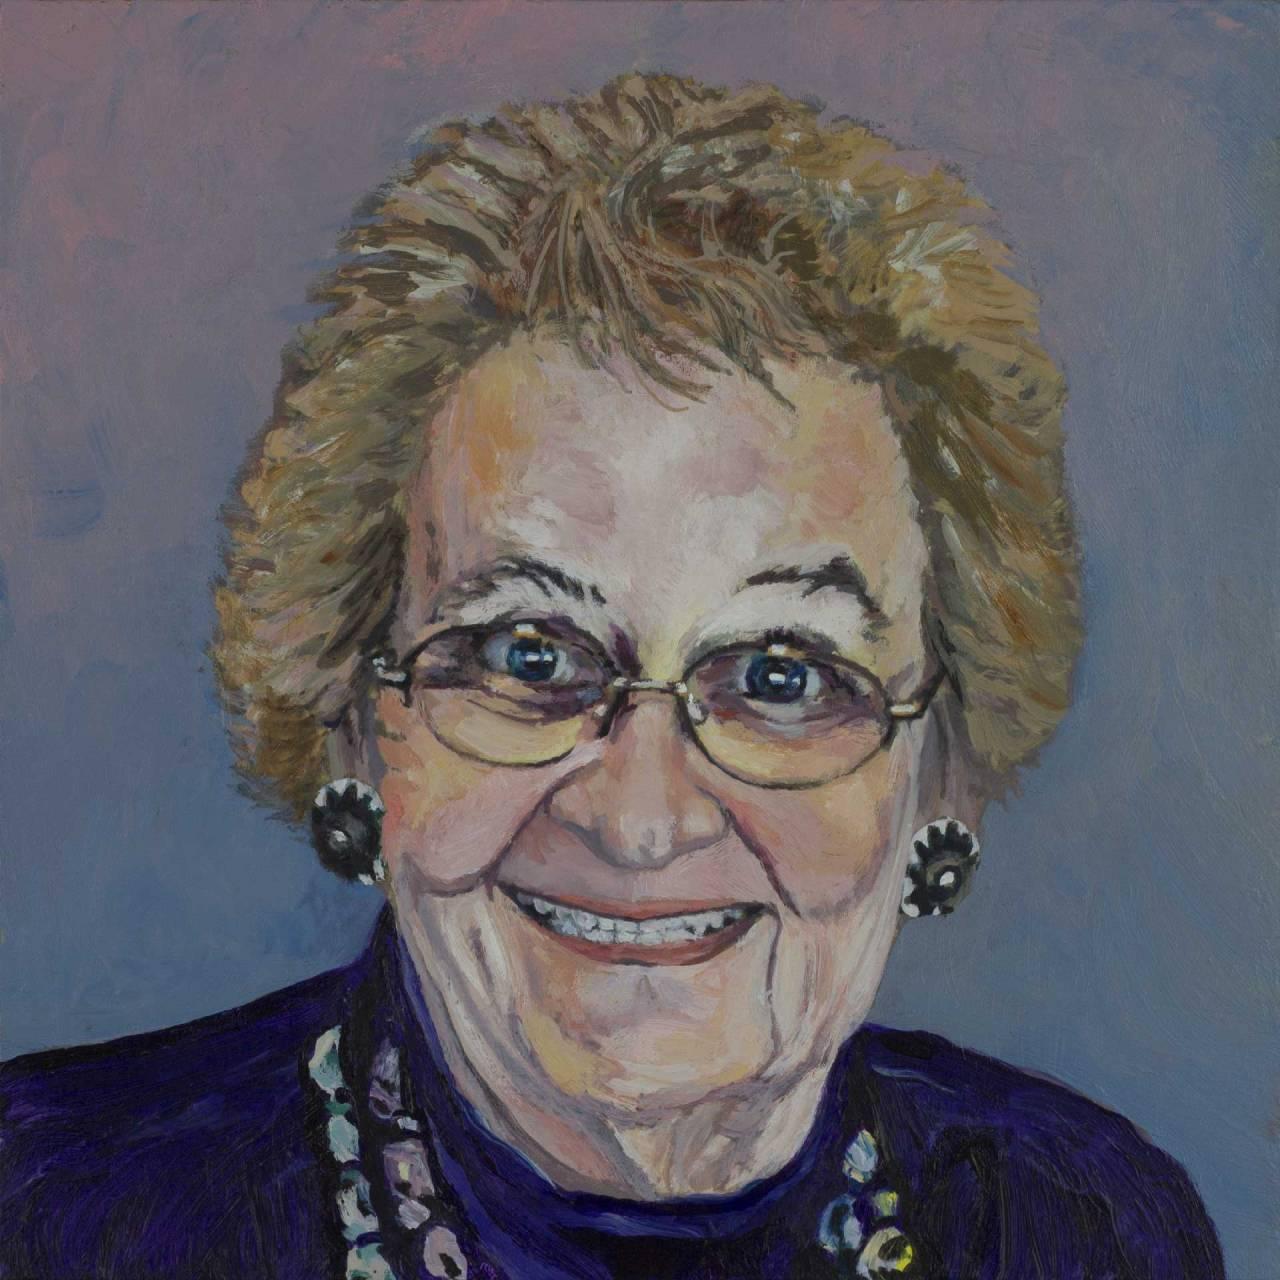 acrylic portrait painting by Steve Miller